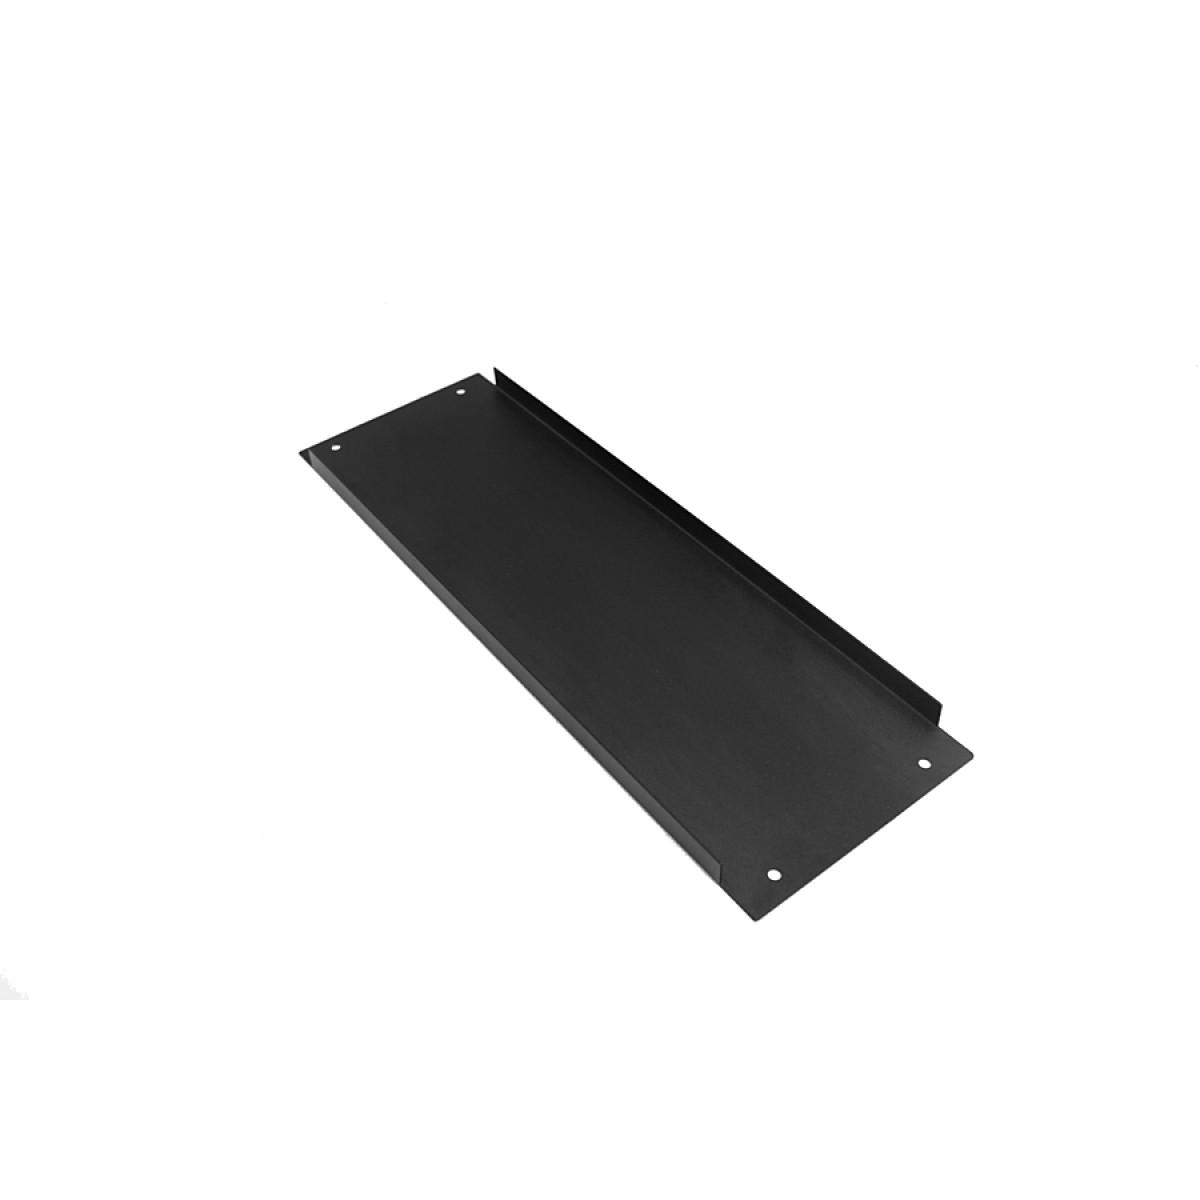 1NPD03300N - 3U Krabice s chladičem, 300mm, 10mm-panel černý